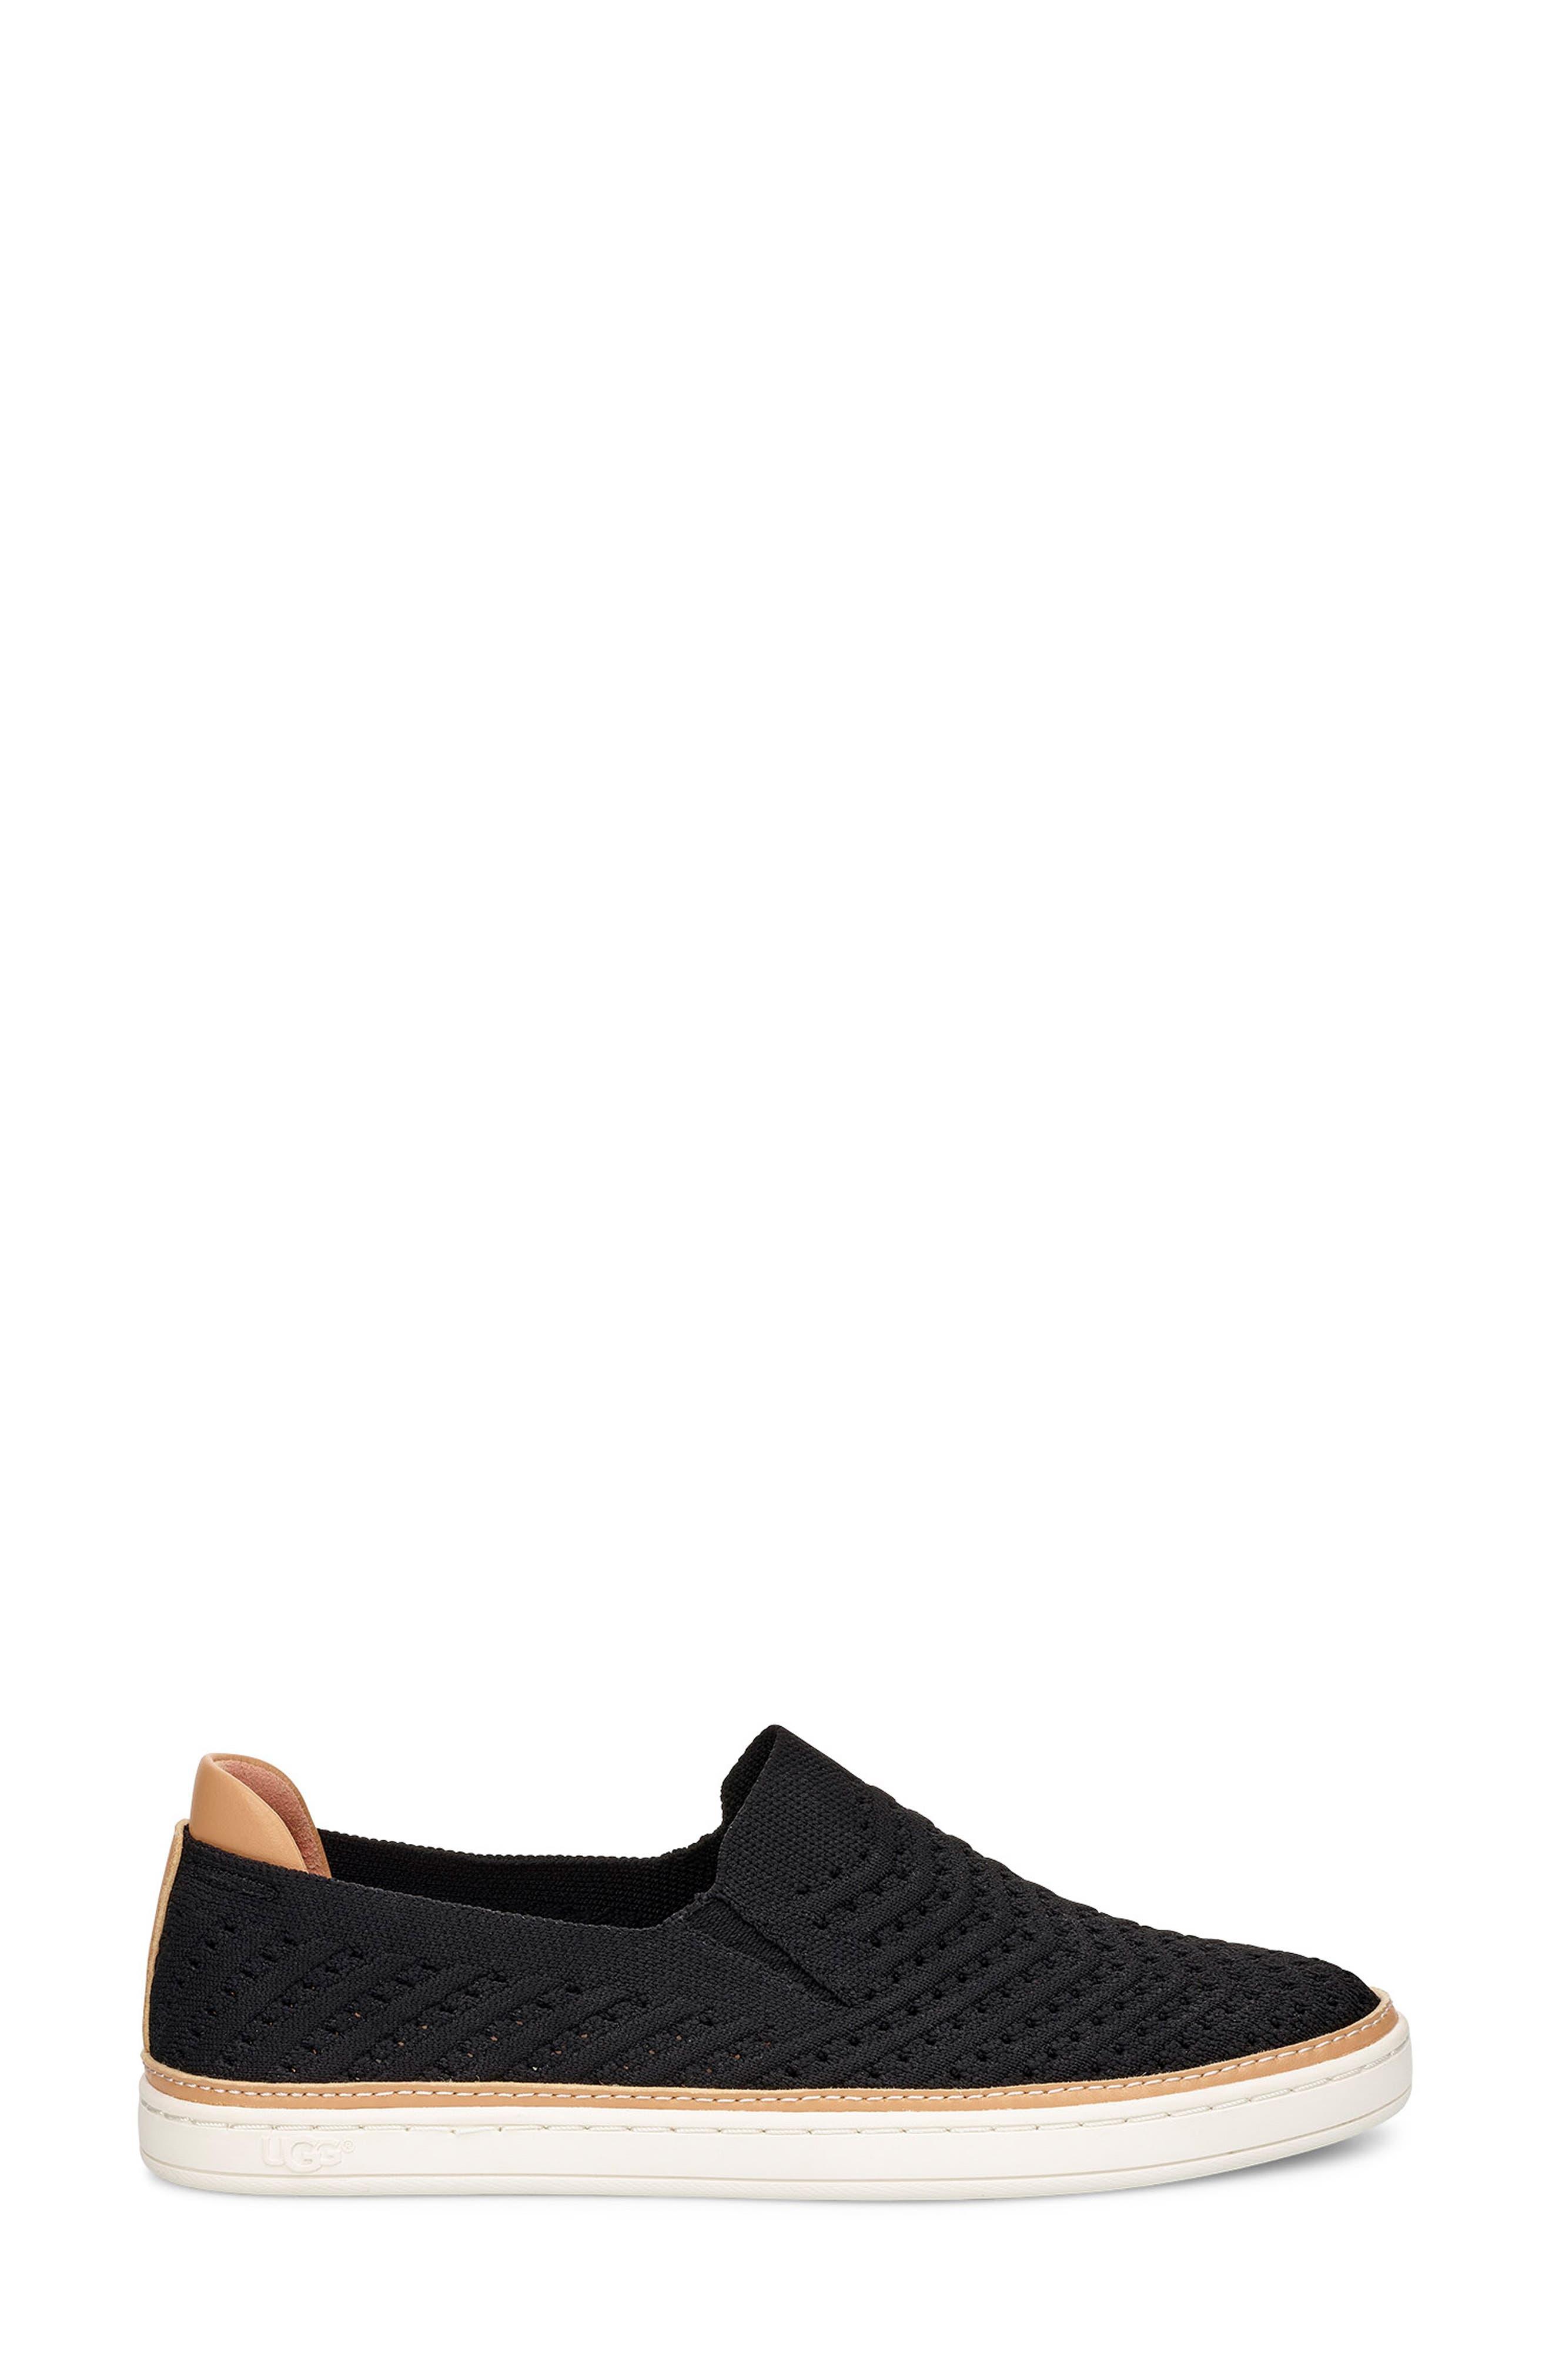 UGG<SUP>®</SUP>, Sammy Slip-On Sneaker, Alternate thumbnail 3, color, BLACK FABRIC